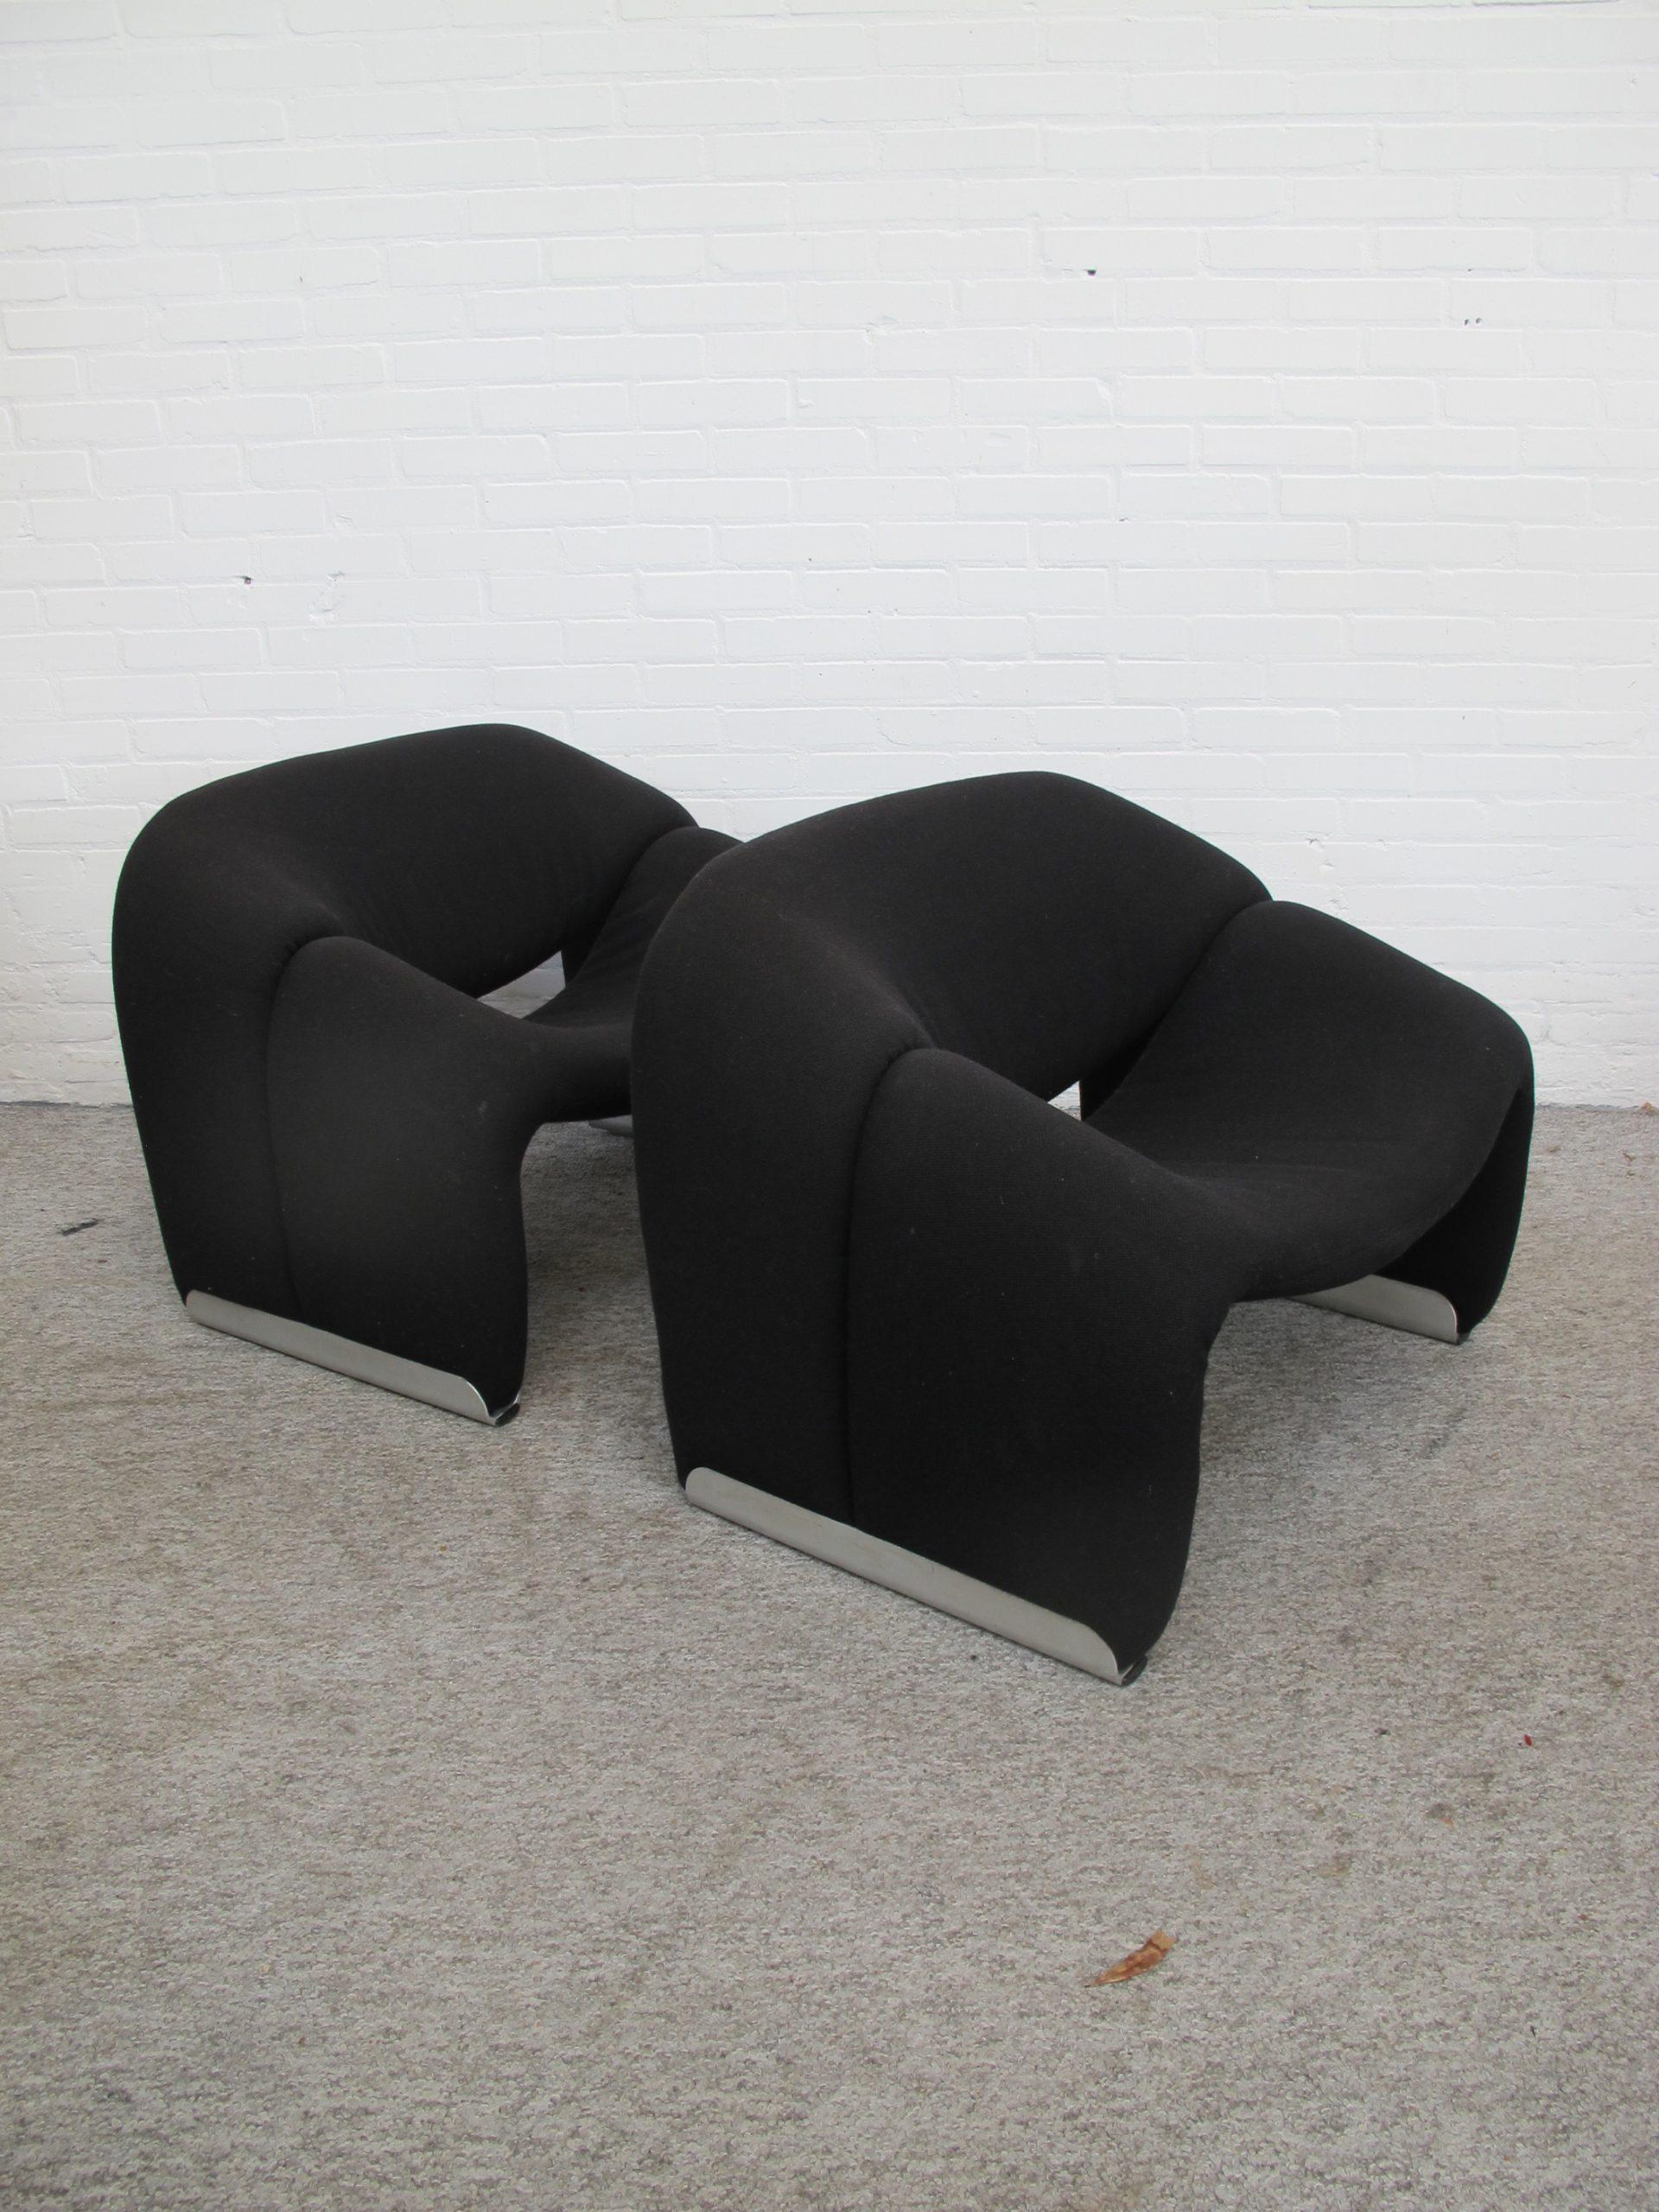 Fauteuil Groovy fauteuils F598 M-Chair Pierre Paulin Artifort vintage midcentury